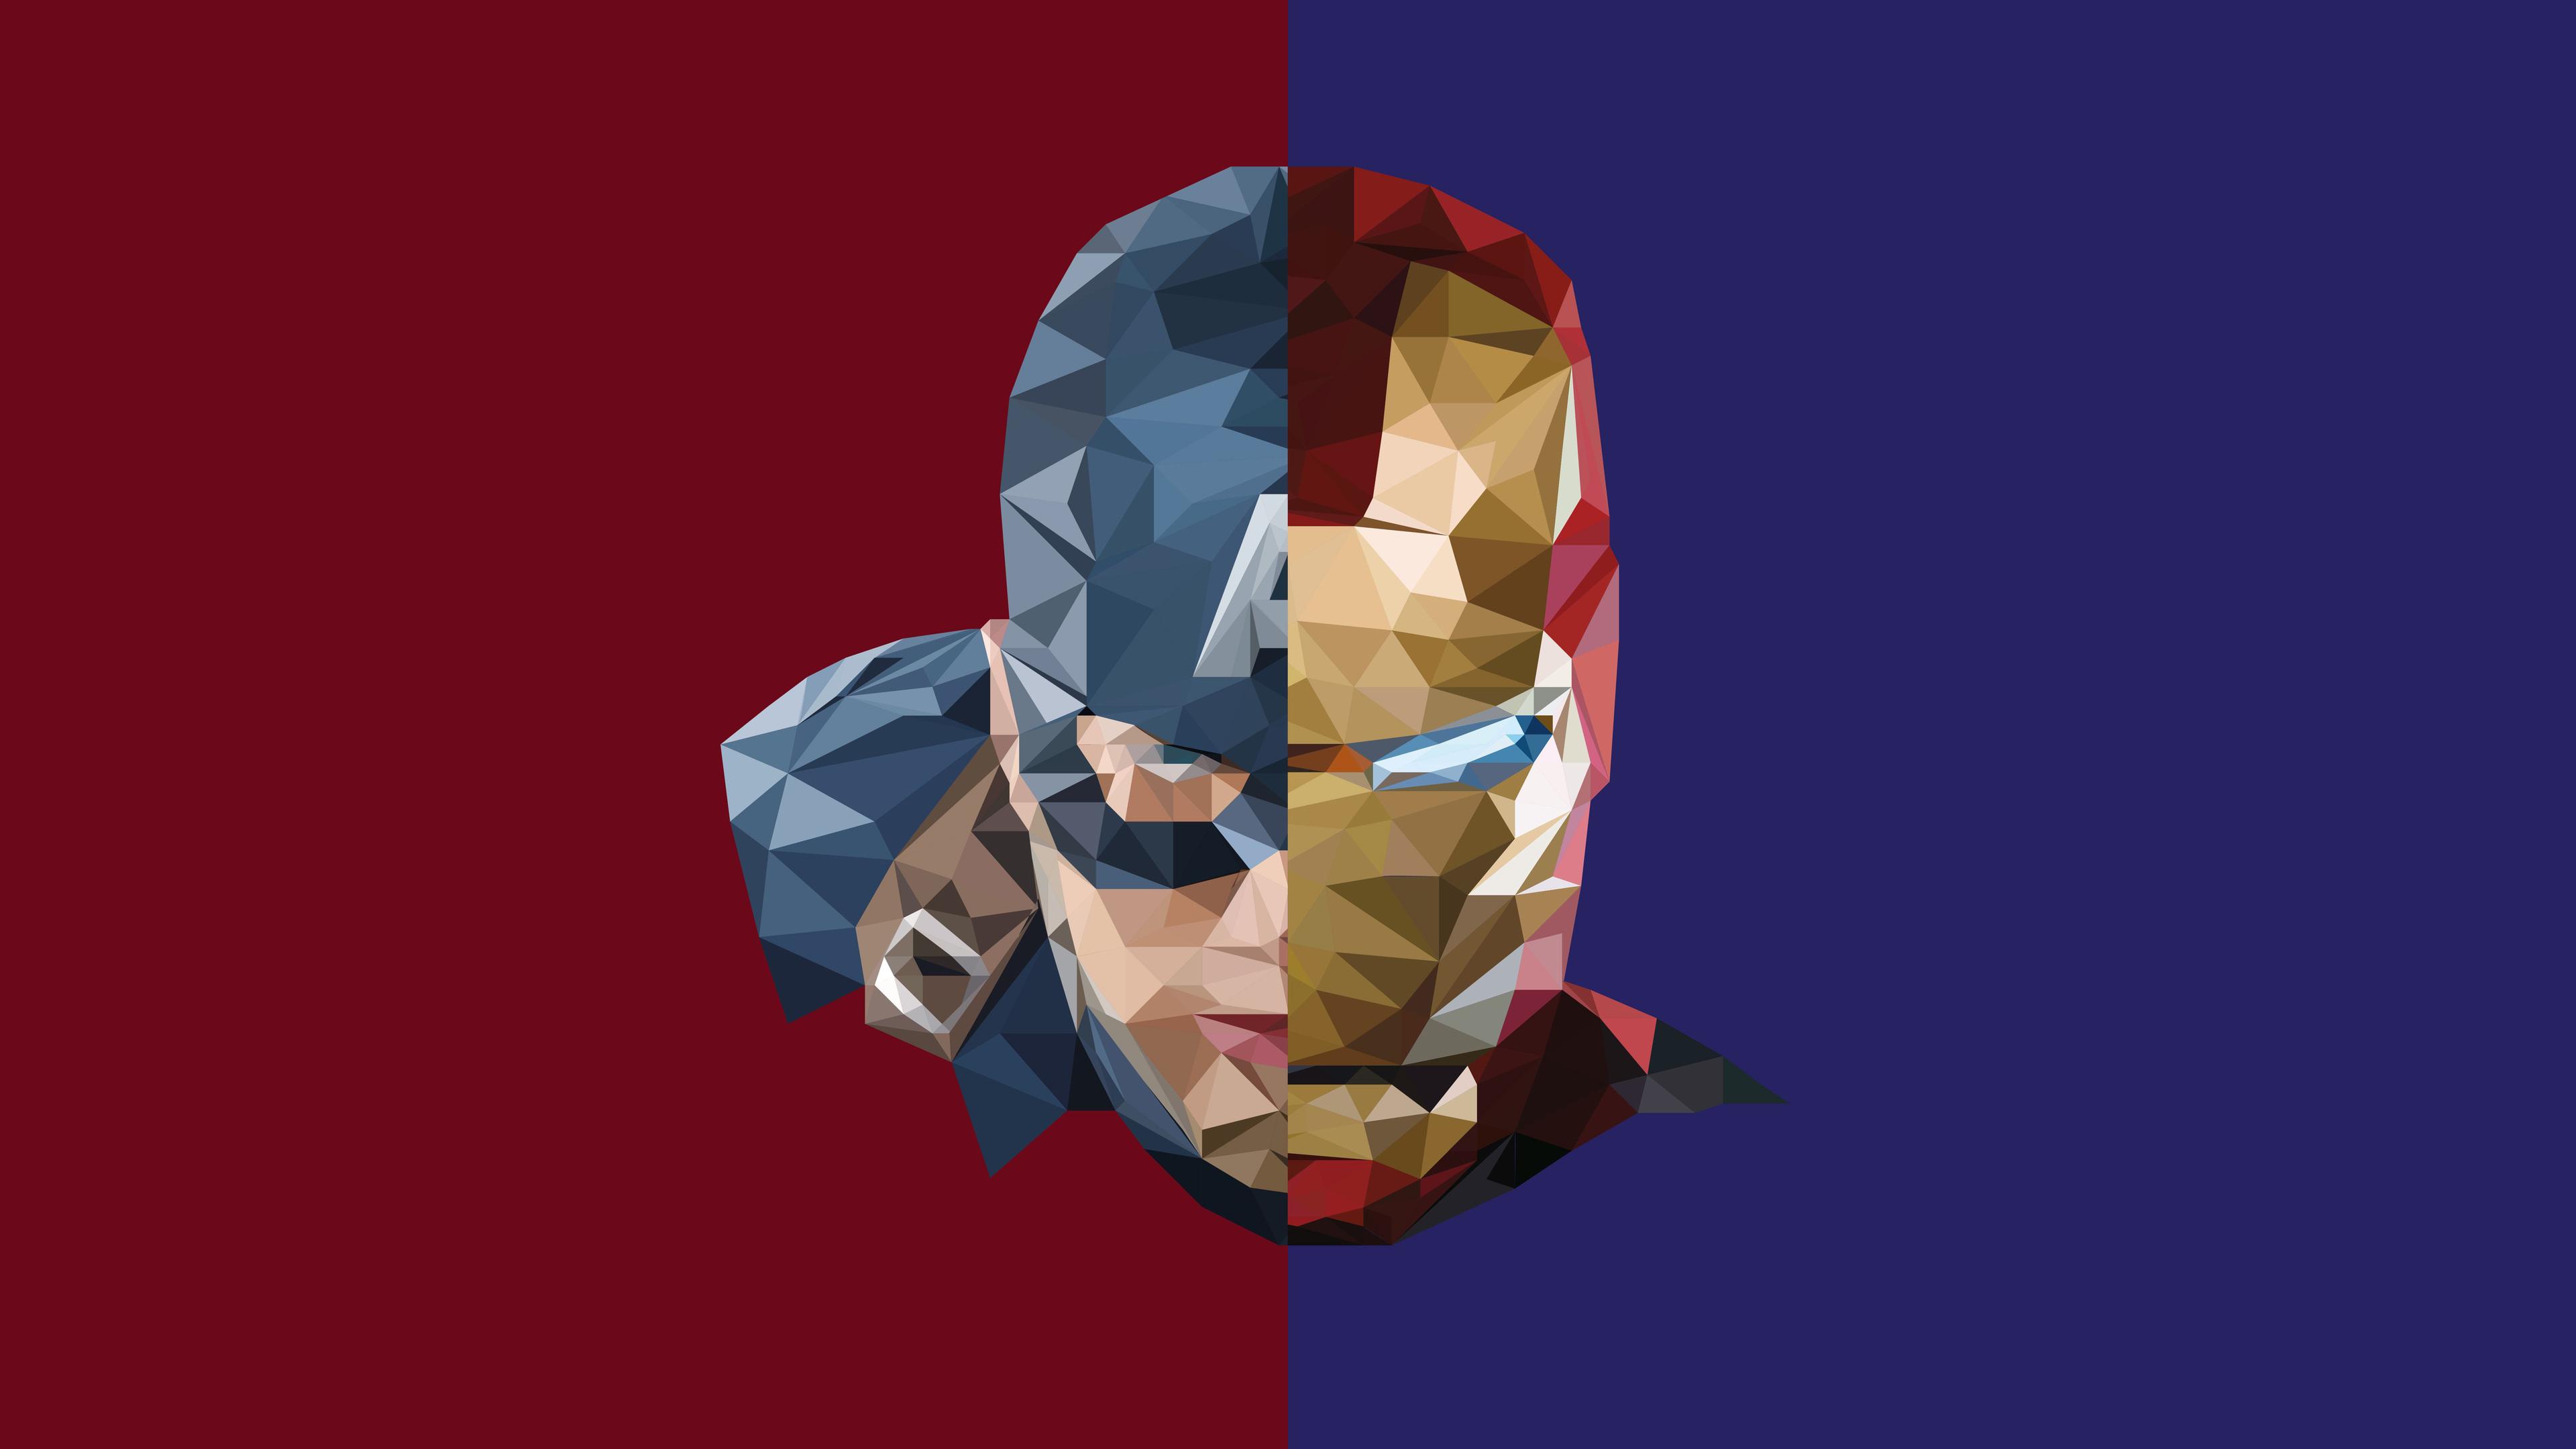 1280x1280 Car Wallpaper Iron Man Captain America Abstract Iron Man Wallpapers Hd